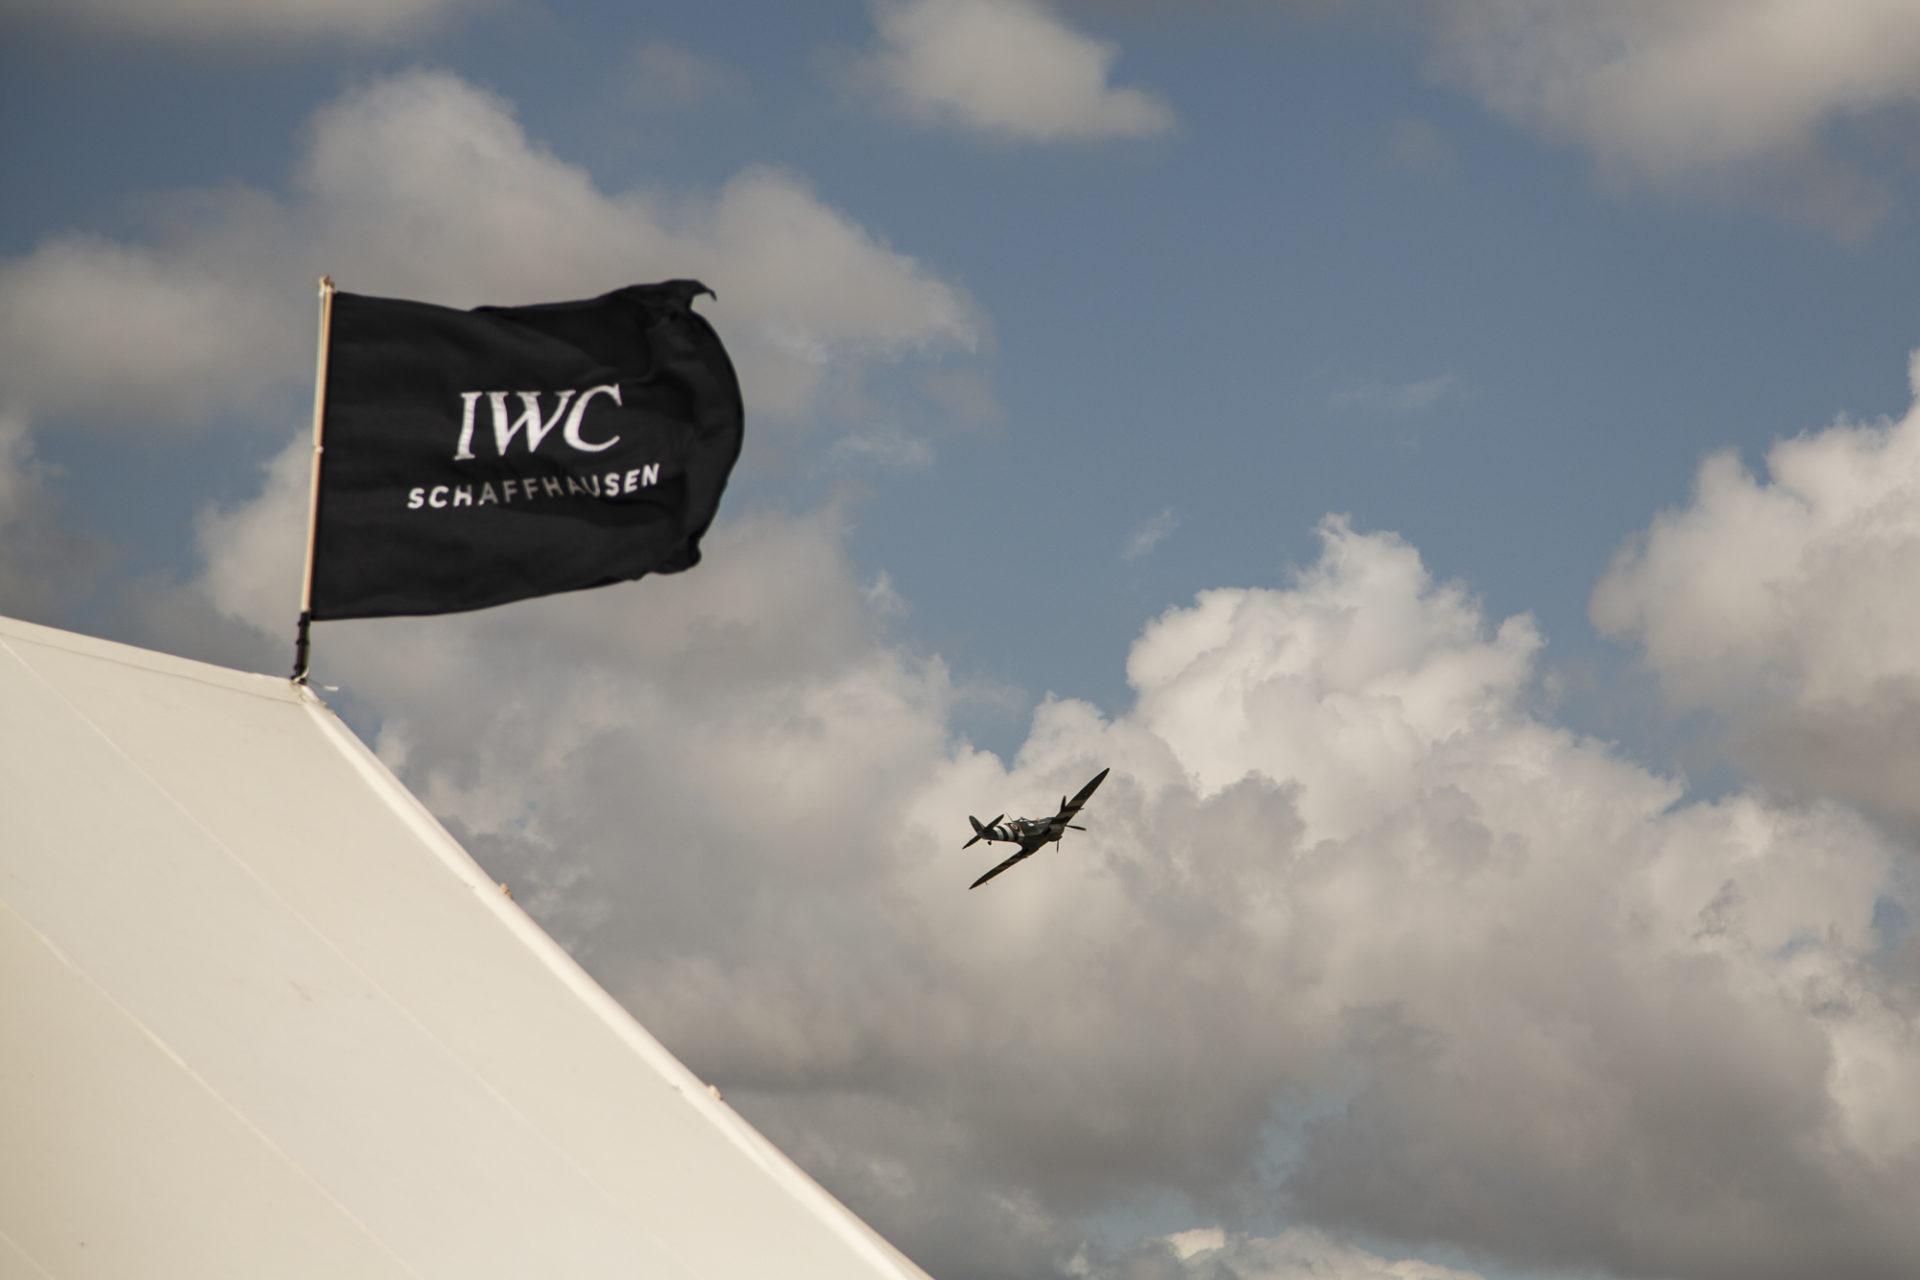 IWC Célèbre The Longest Flight